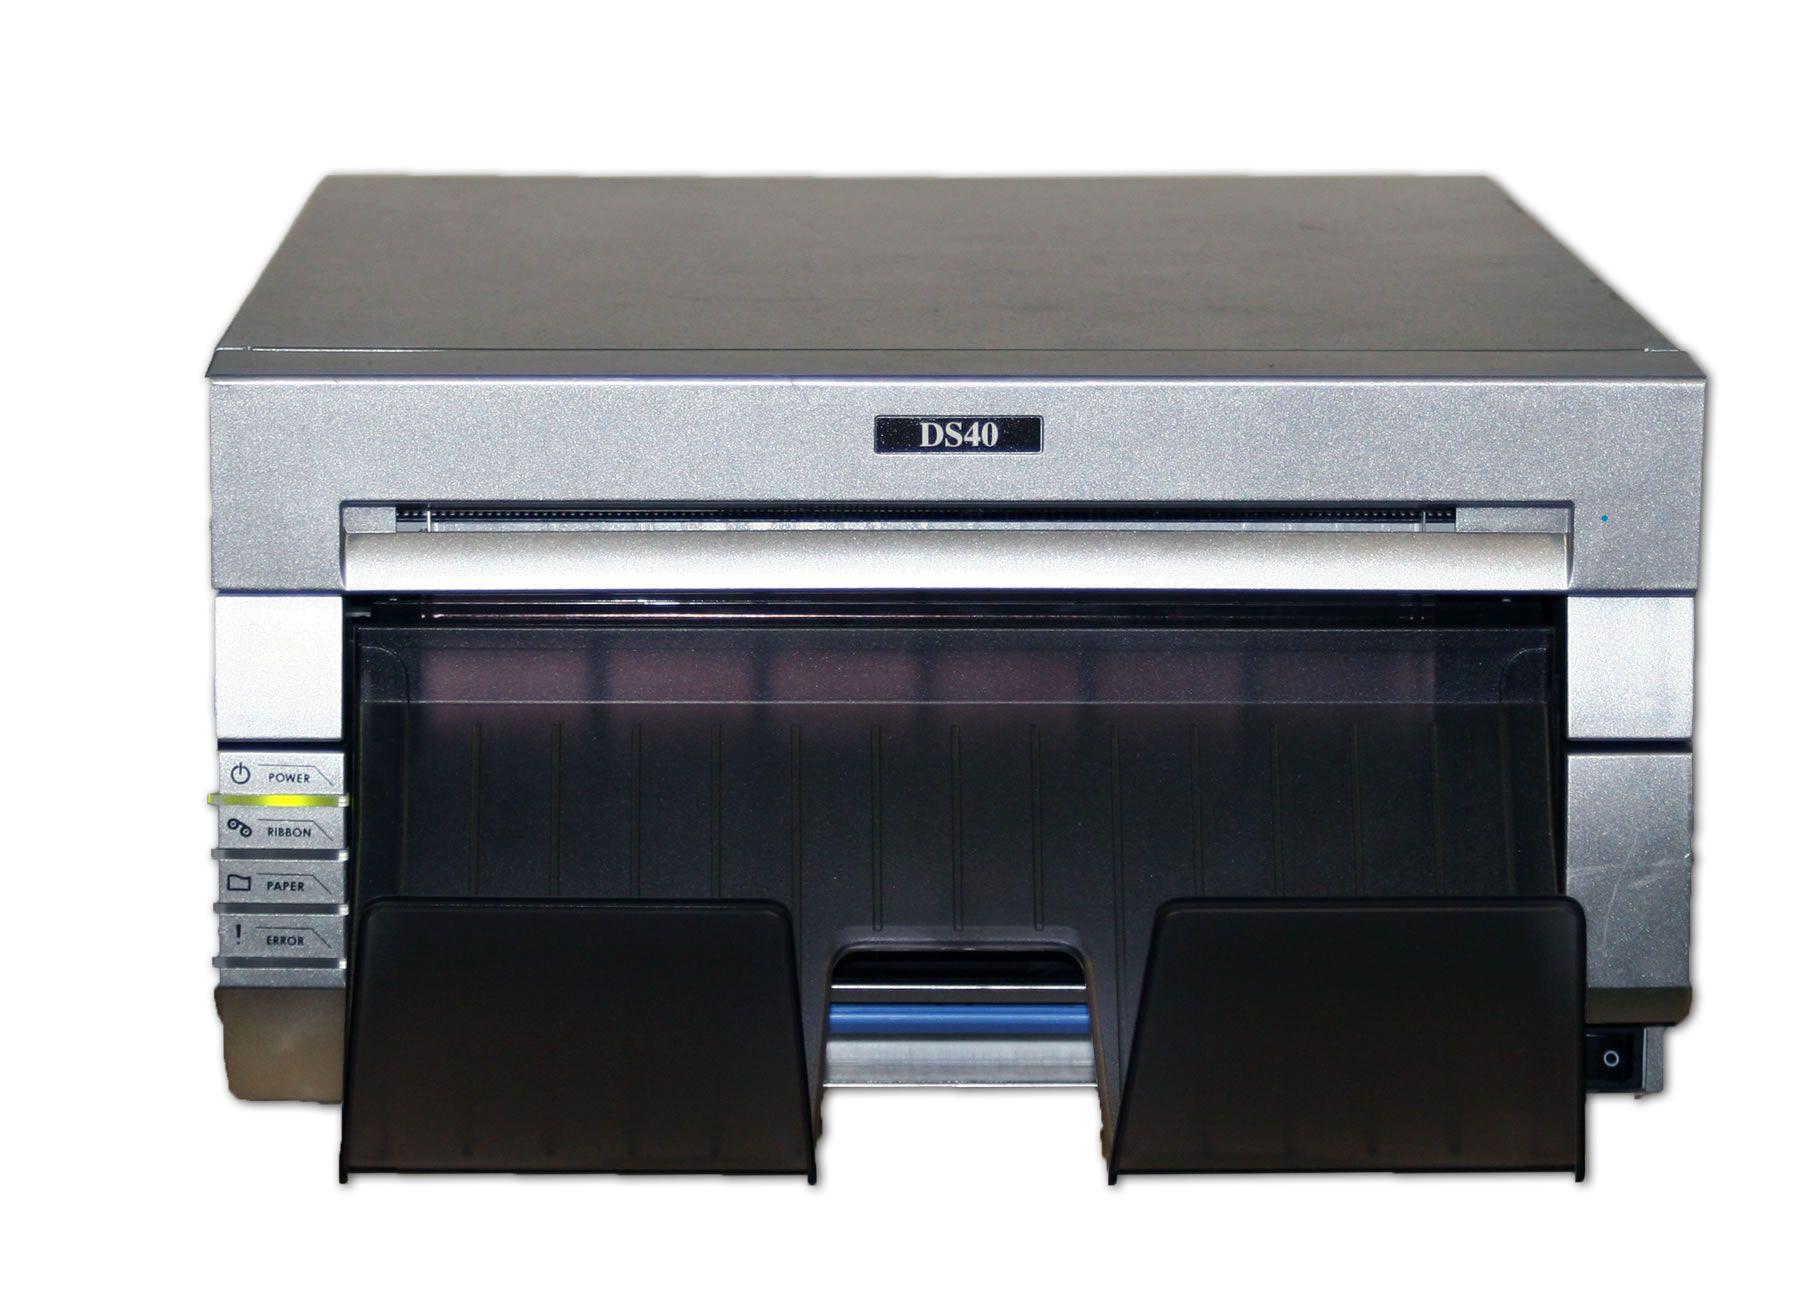 Dnp Ds 40 Printer The Compact 4x6 5x7 6x9 Professional Paper Kit Kodak 605 Photo